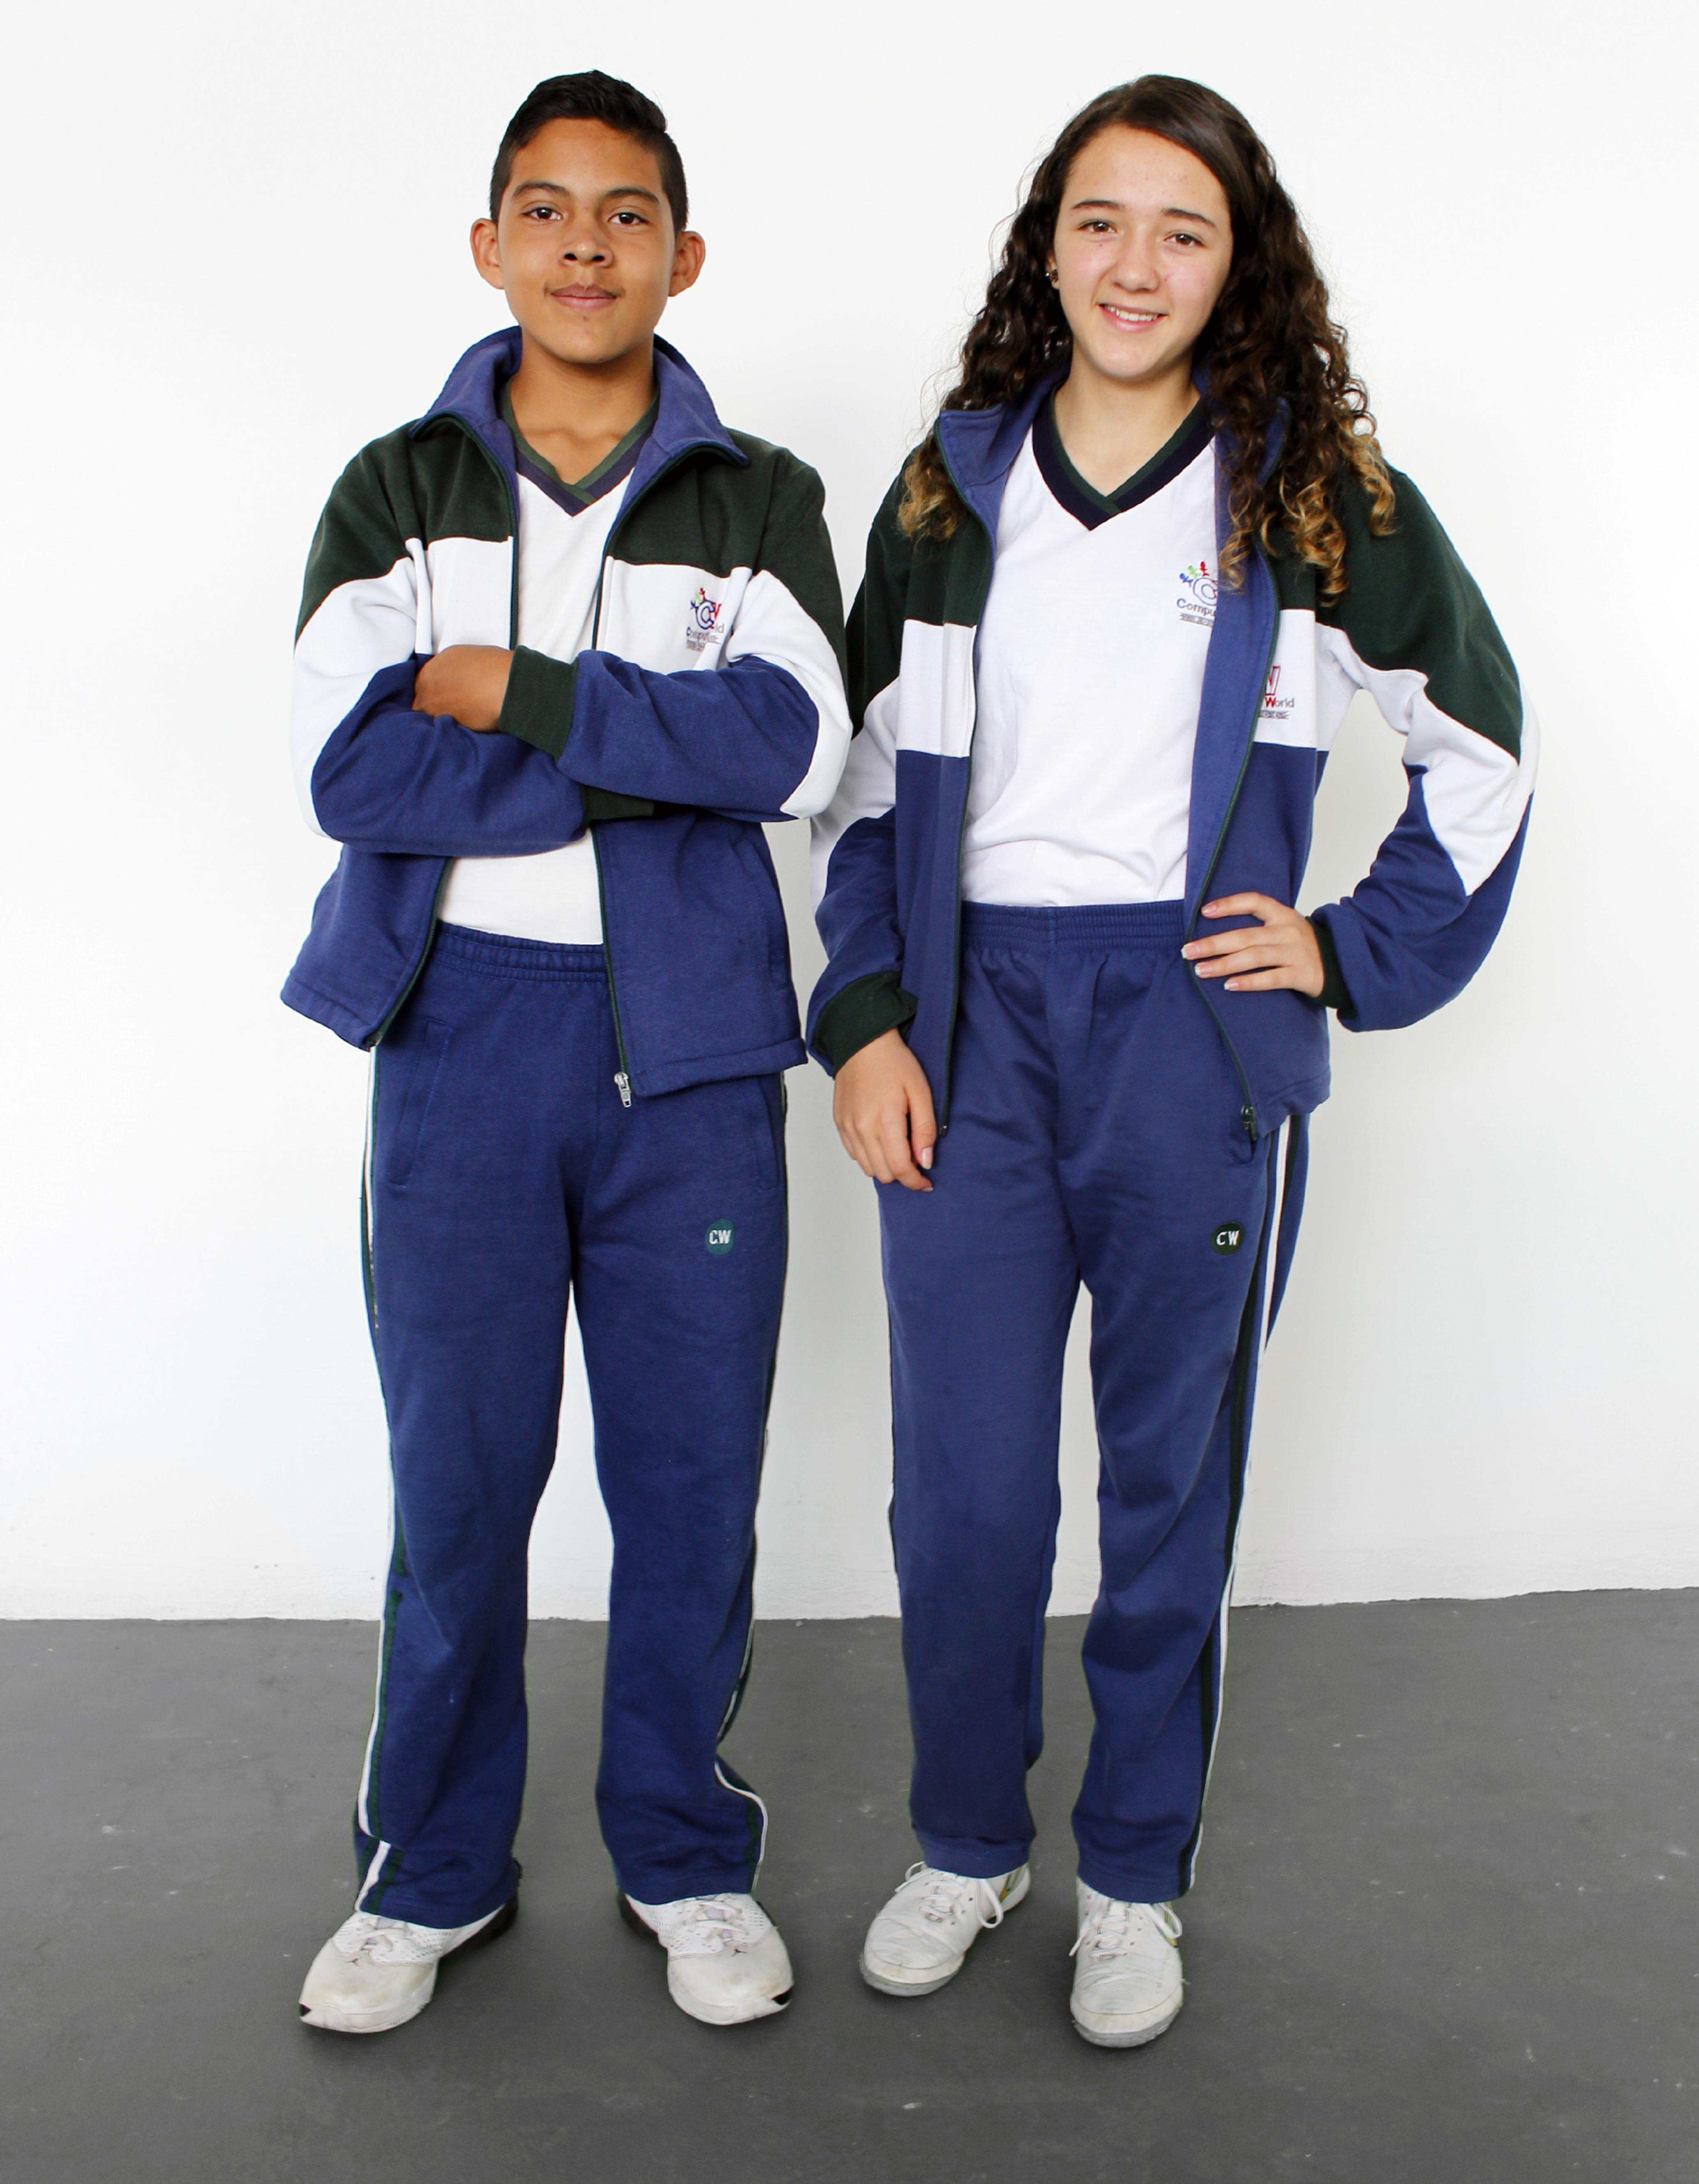 Uniforme de Cultura Física / Deportes